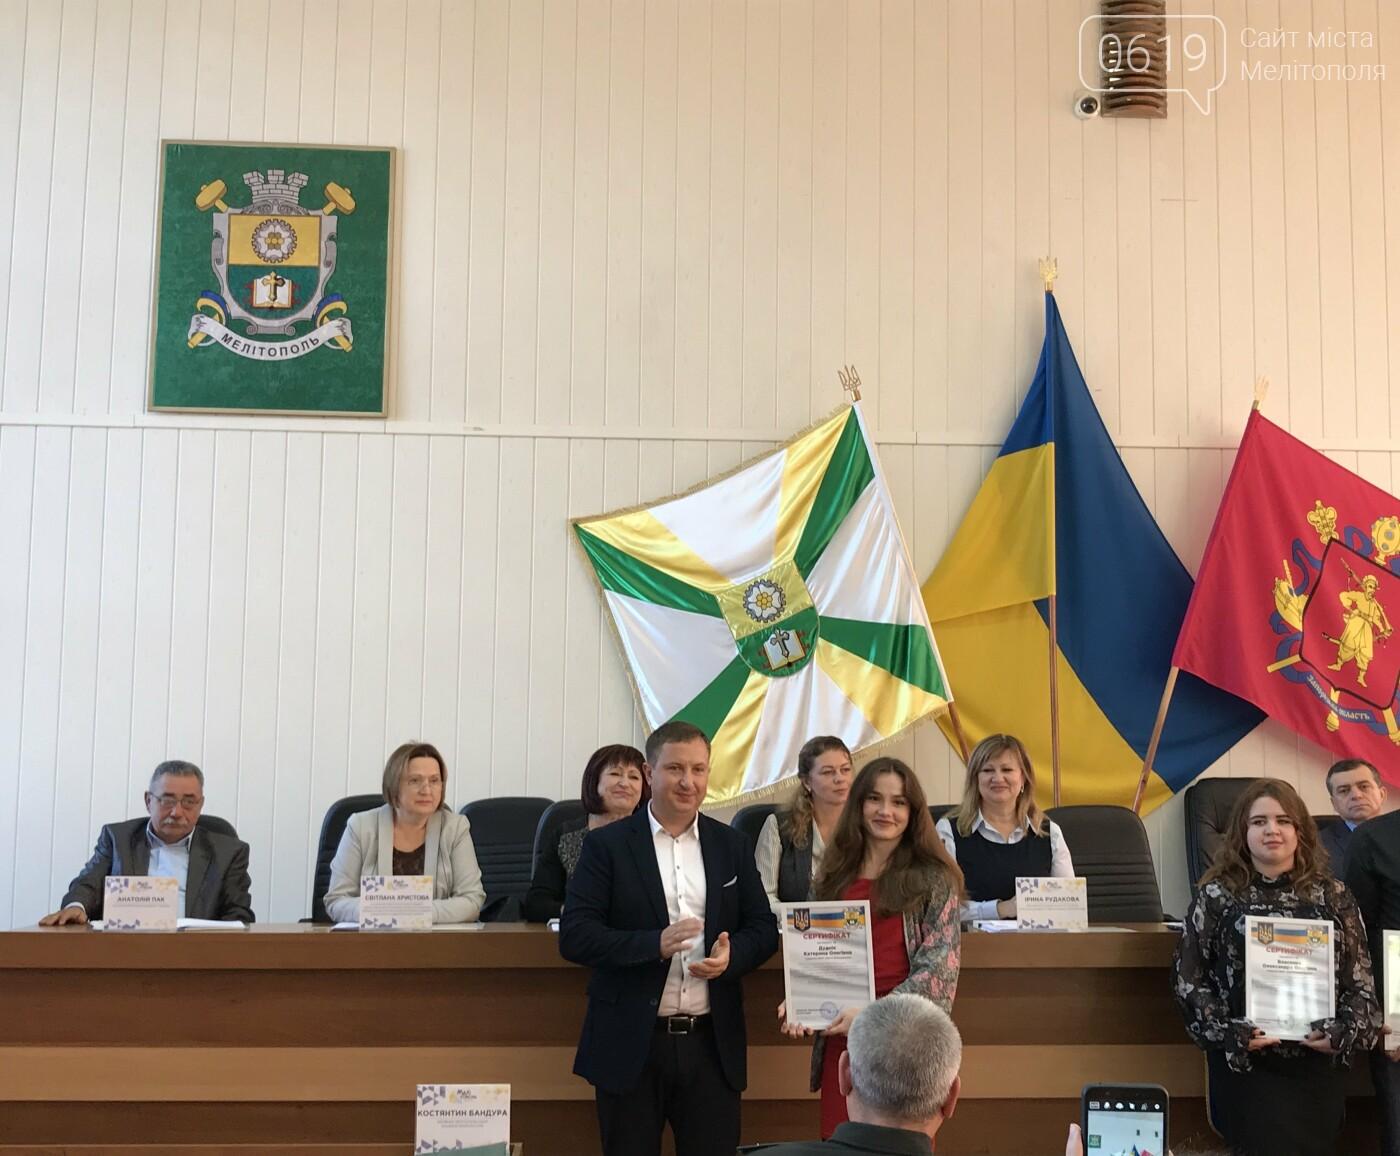 Одаренную молодежь Мелитополя наградили стипендиями мэра, фото-11